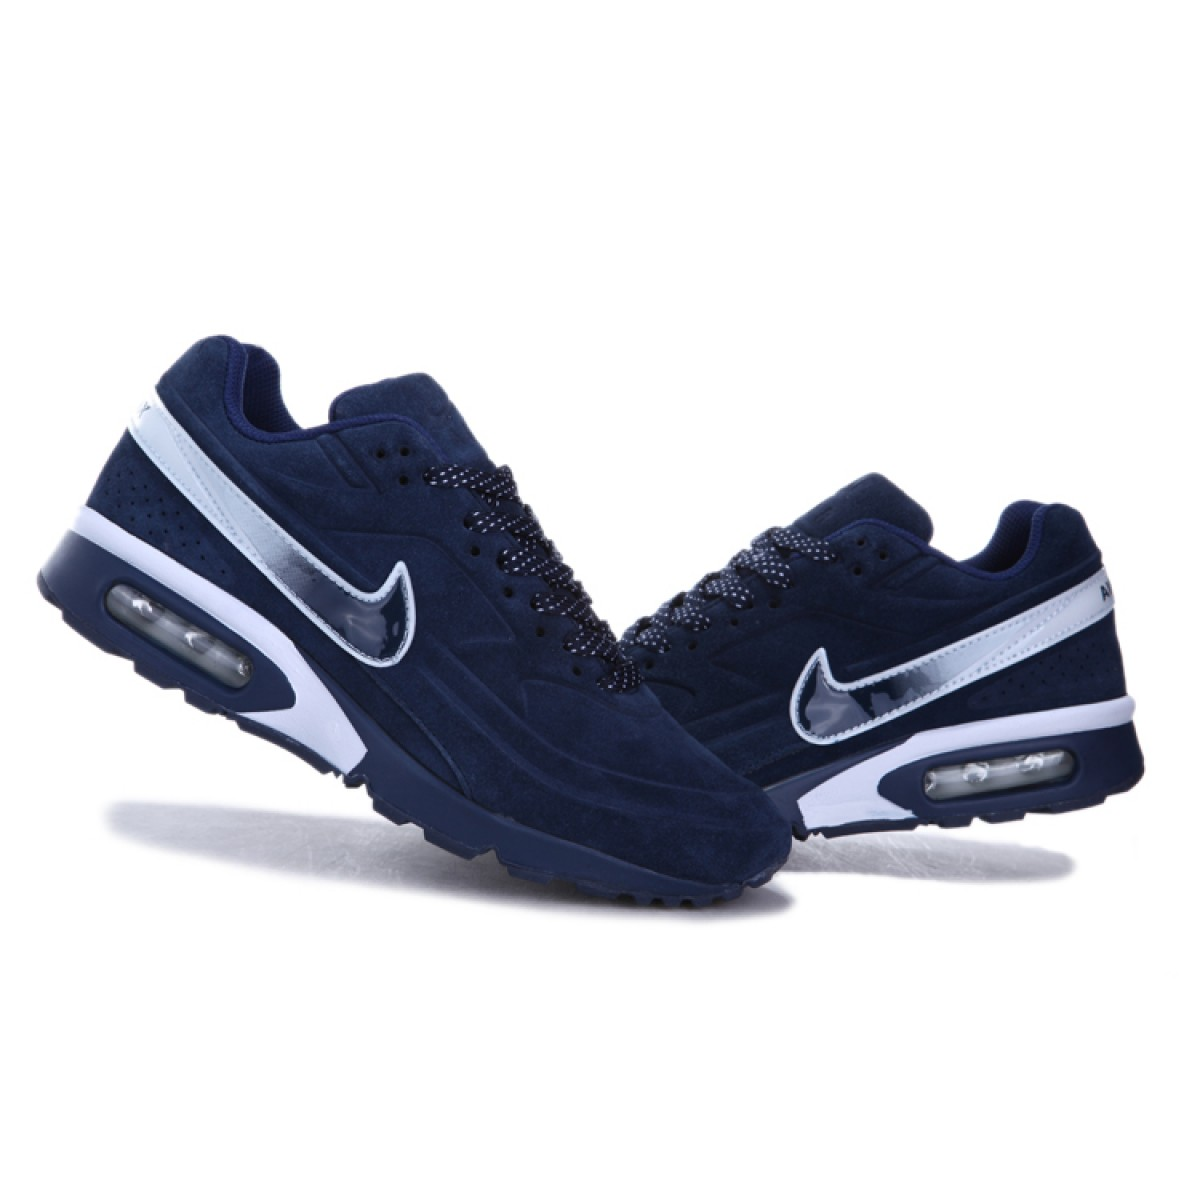 chaussures femme air max classic bw